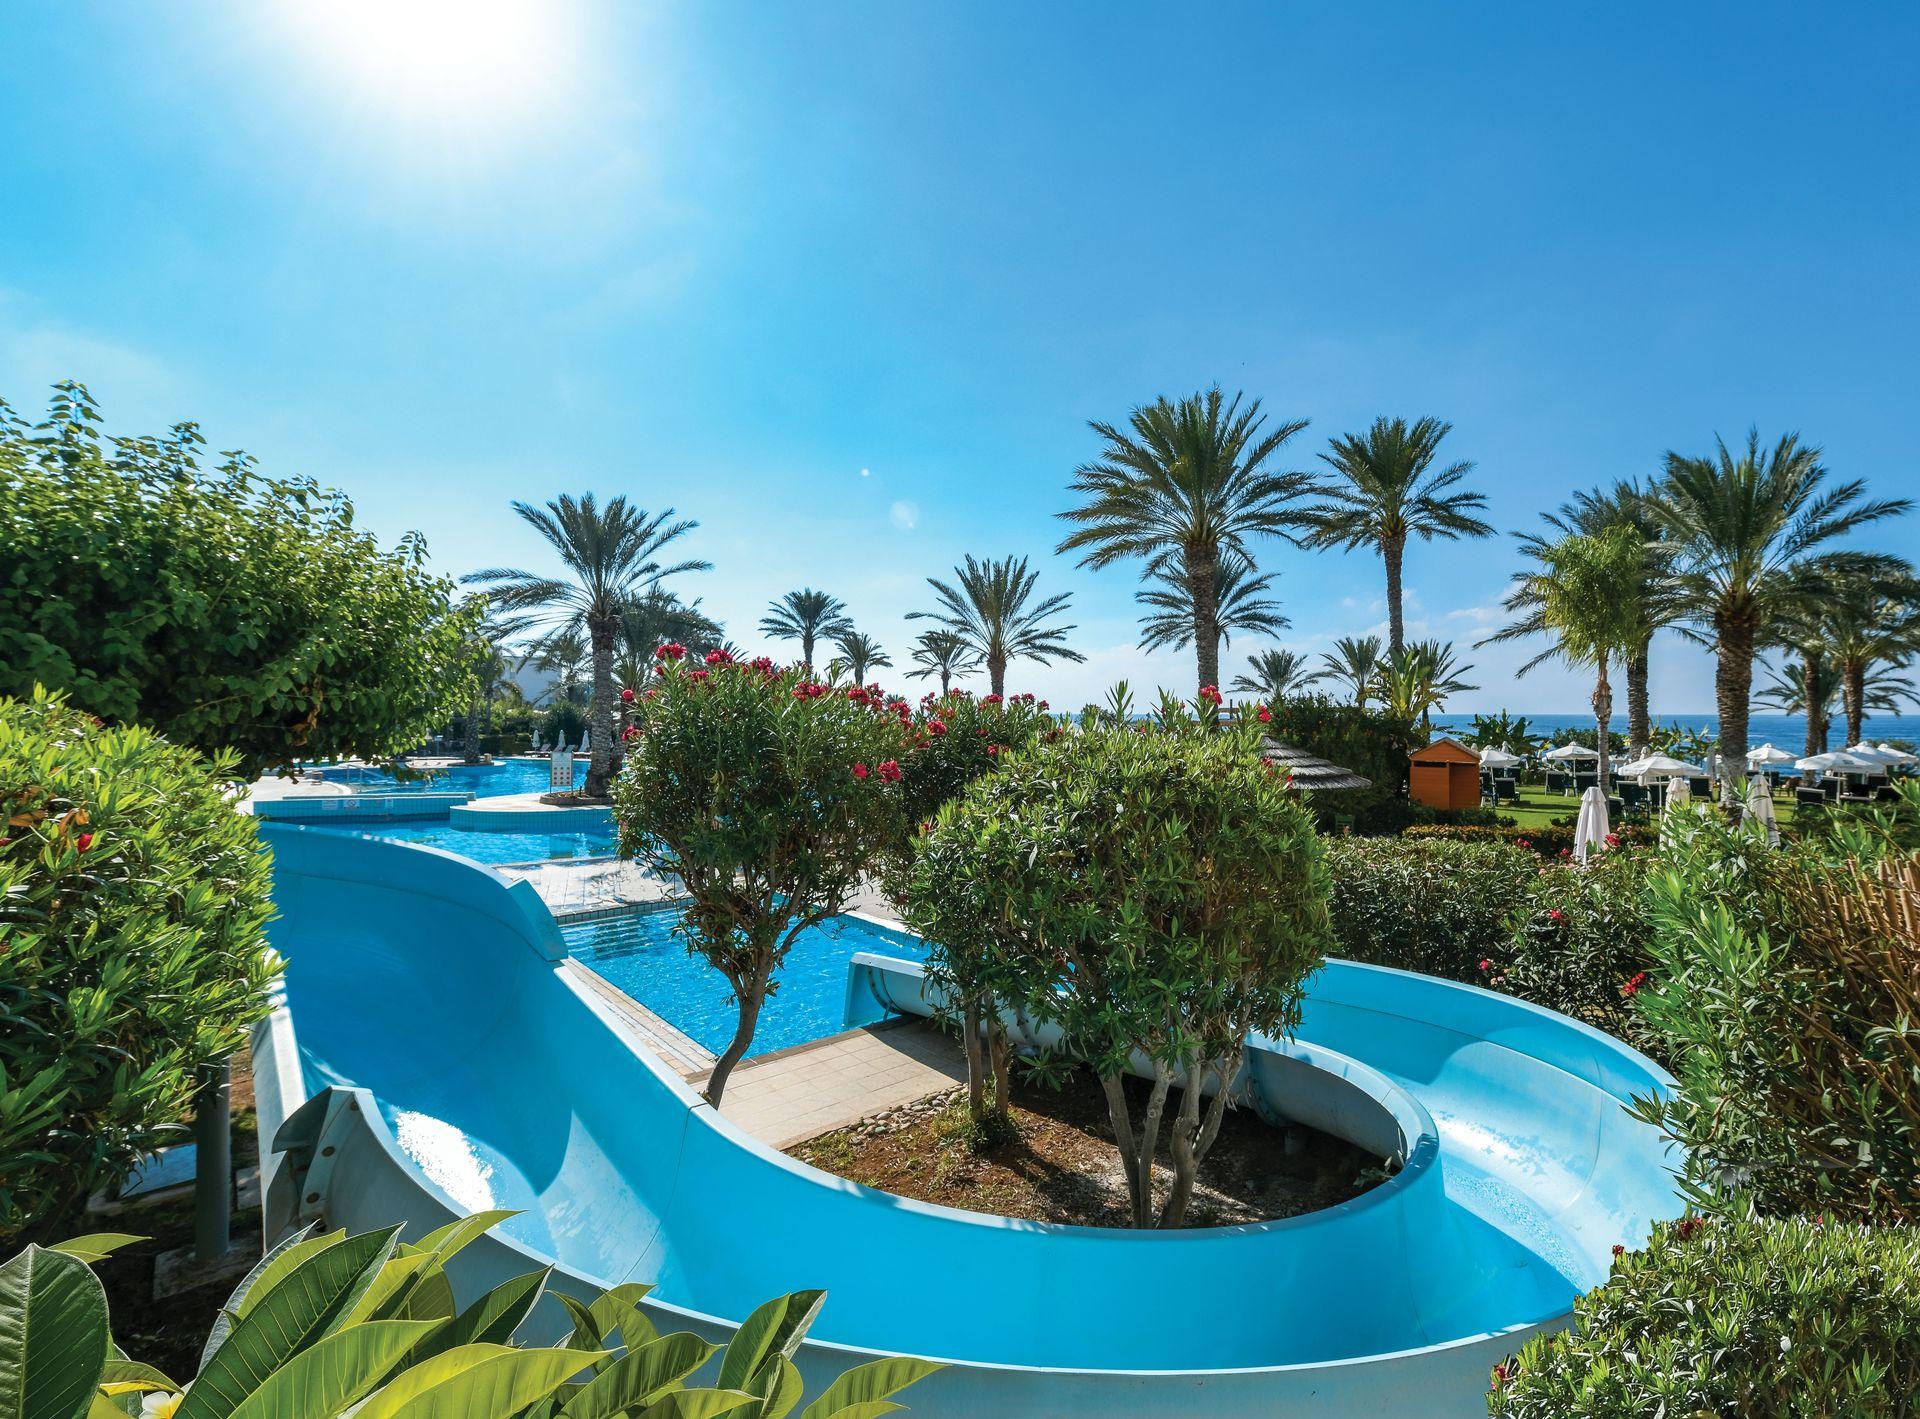 _51 athena beach hotel waterslide_resized